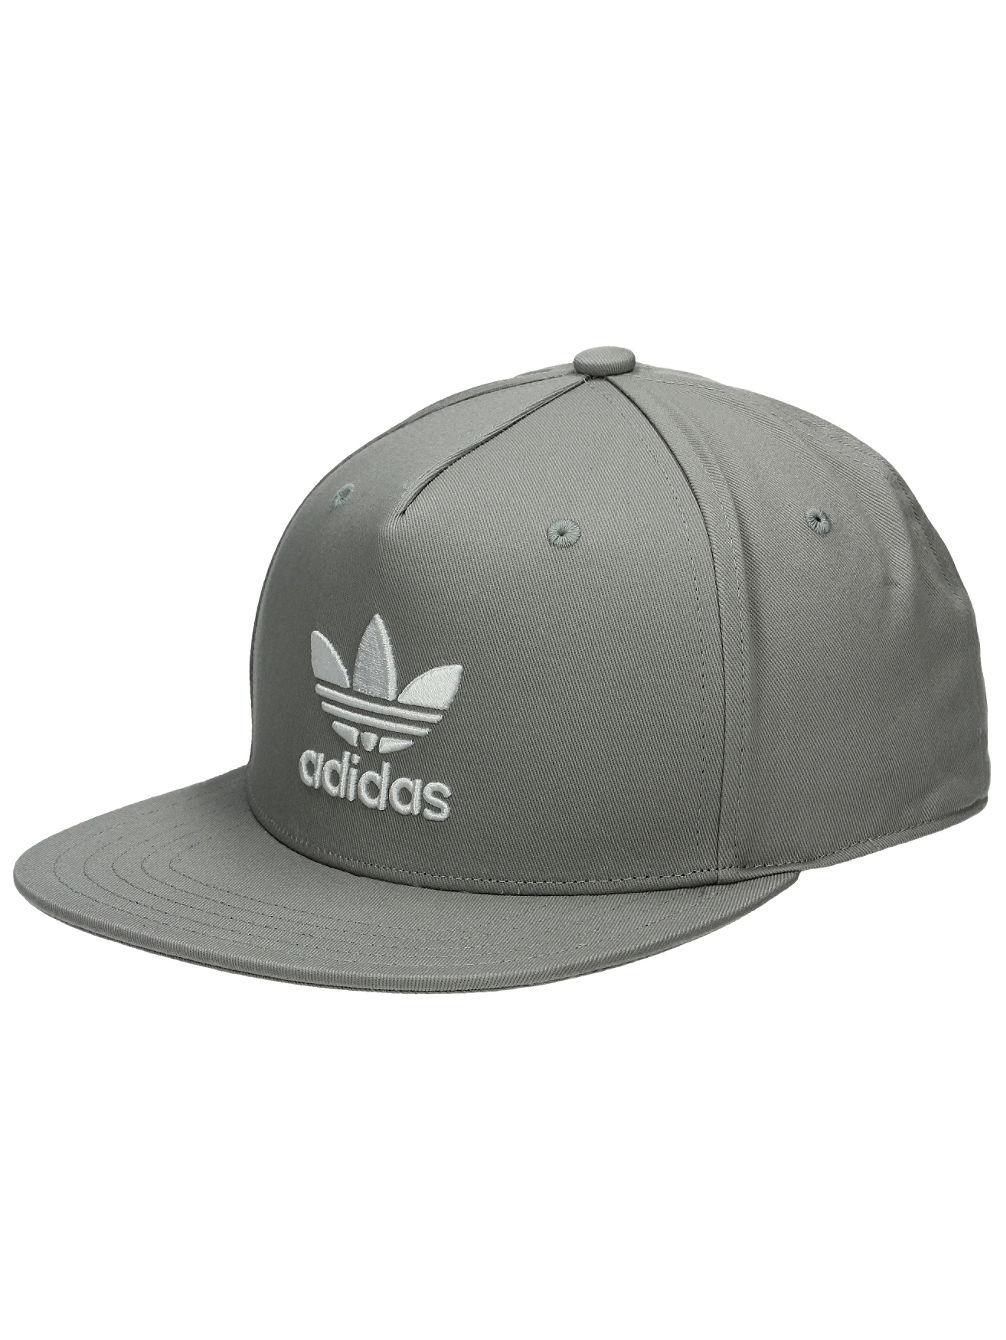 adidas-originals-trefoil-snb-cap